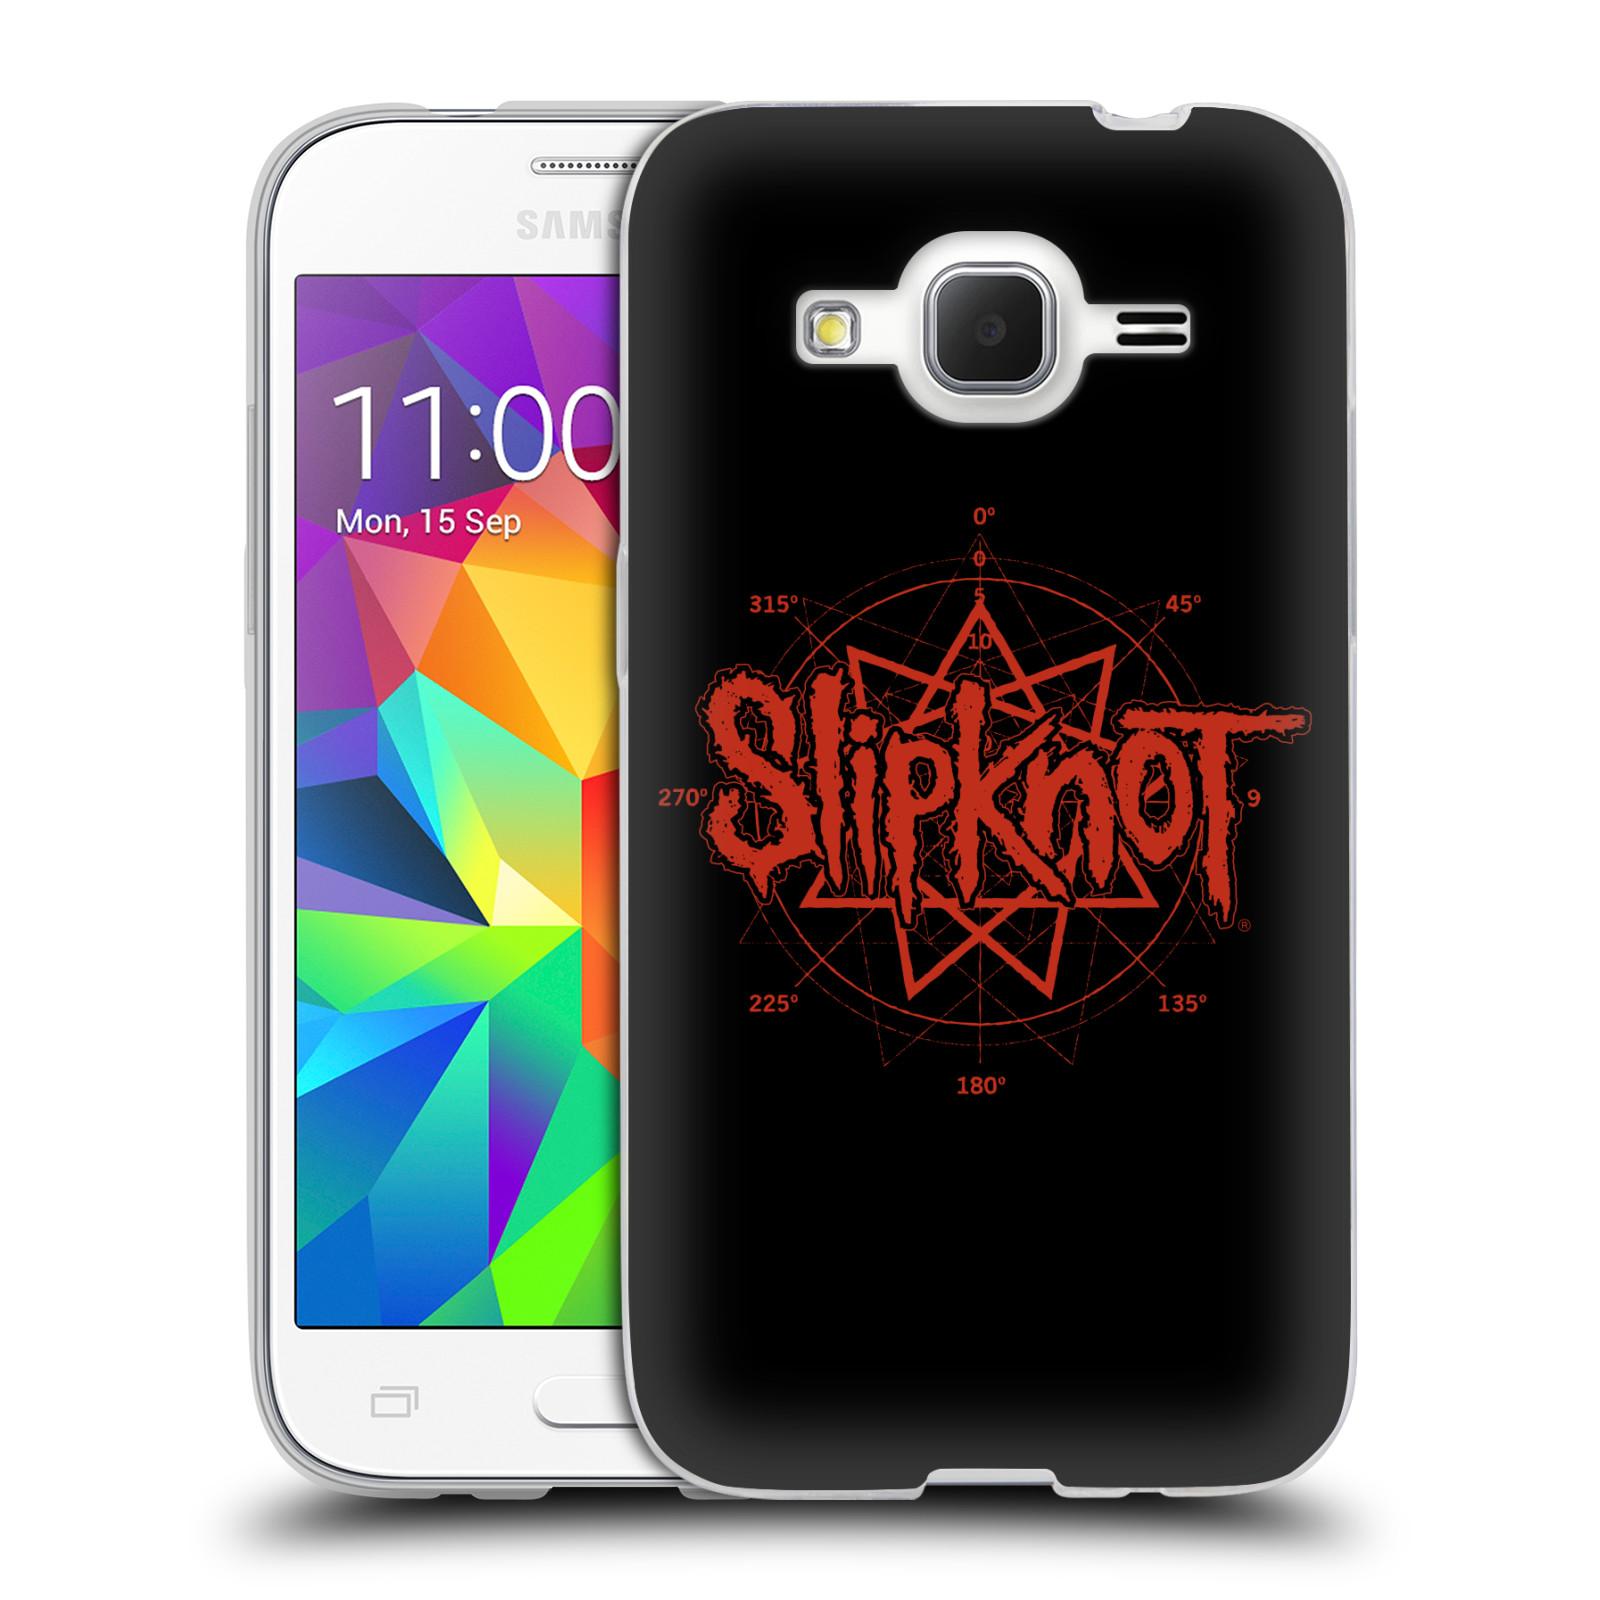 HEAD CASE silikonový obal na mobil Samsung Galaxy Core Prime (G360) hudební skupina Slipknot logo